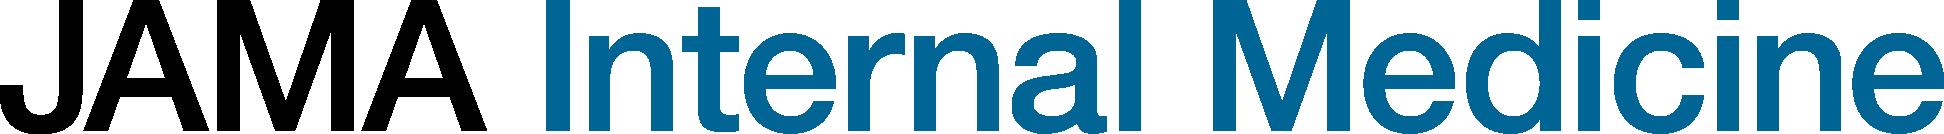 JAMA Internal Medicine Logo